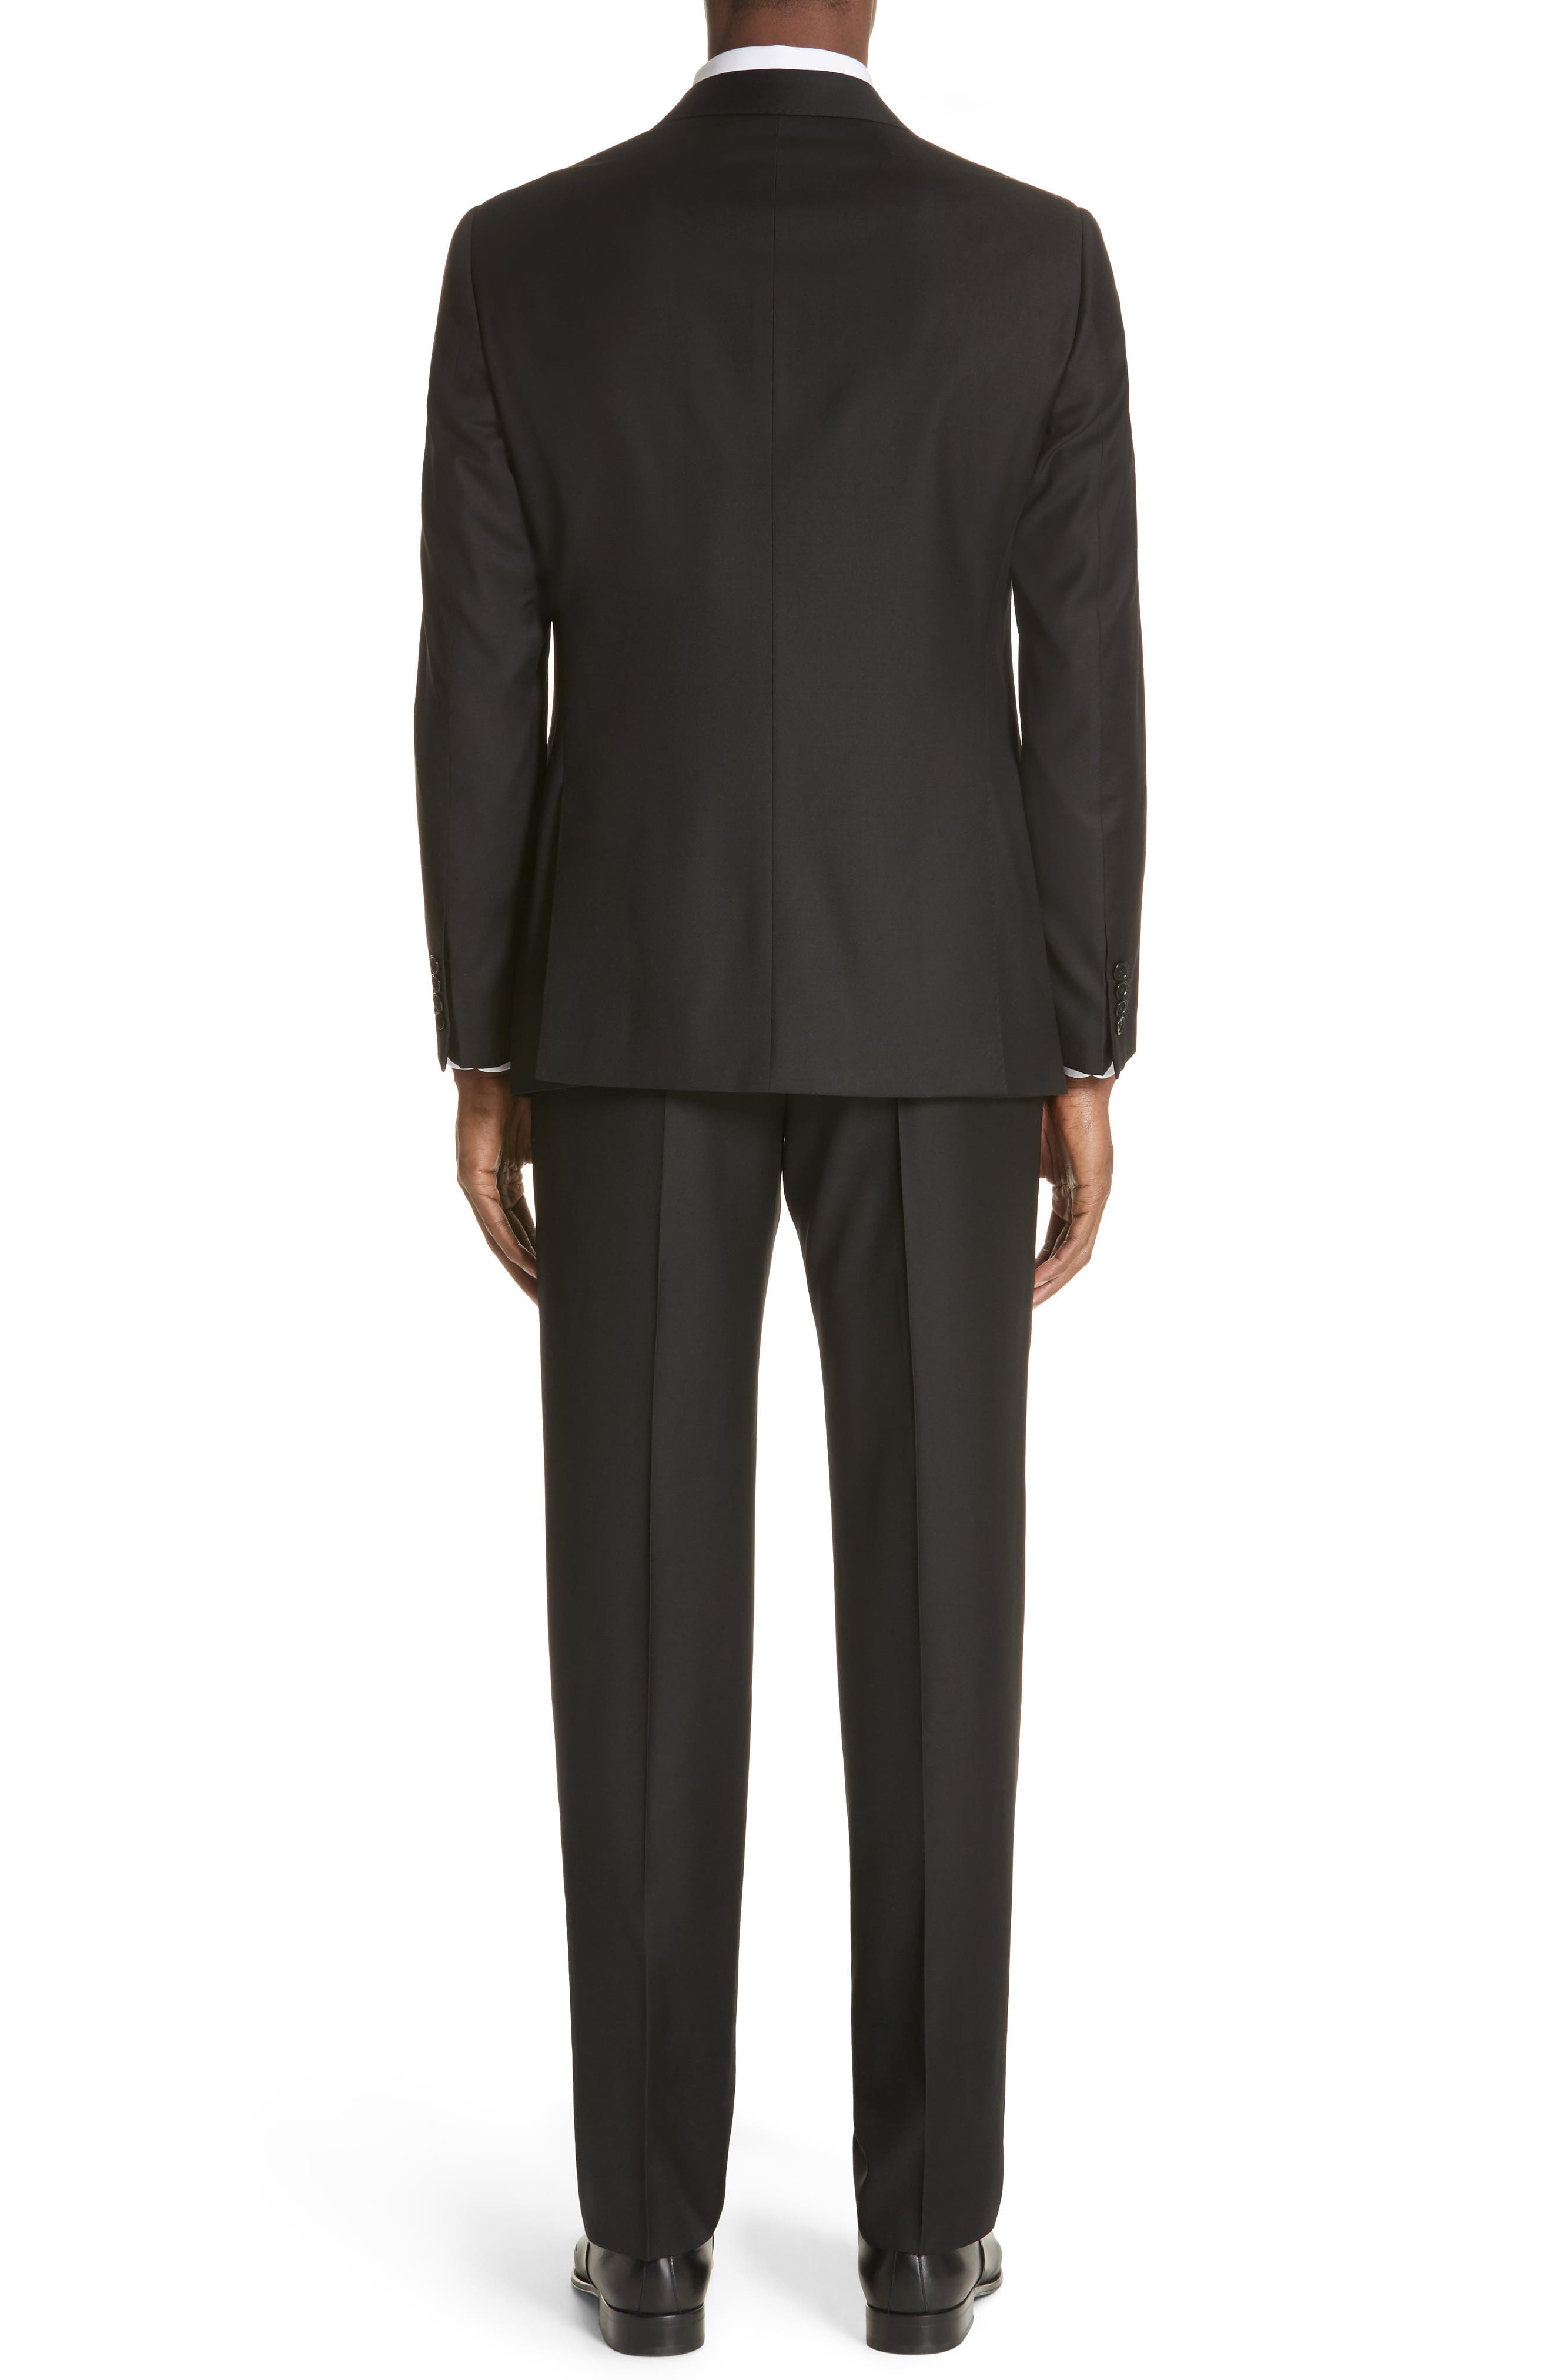 EMPORIO ARMANI, Trim Fit Solid Wool Suit, Alternate thumbnail 2, color, BLACK